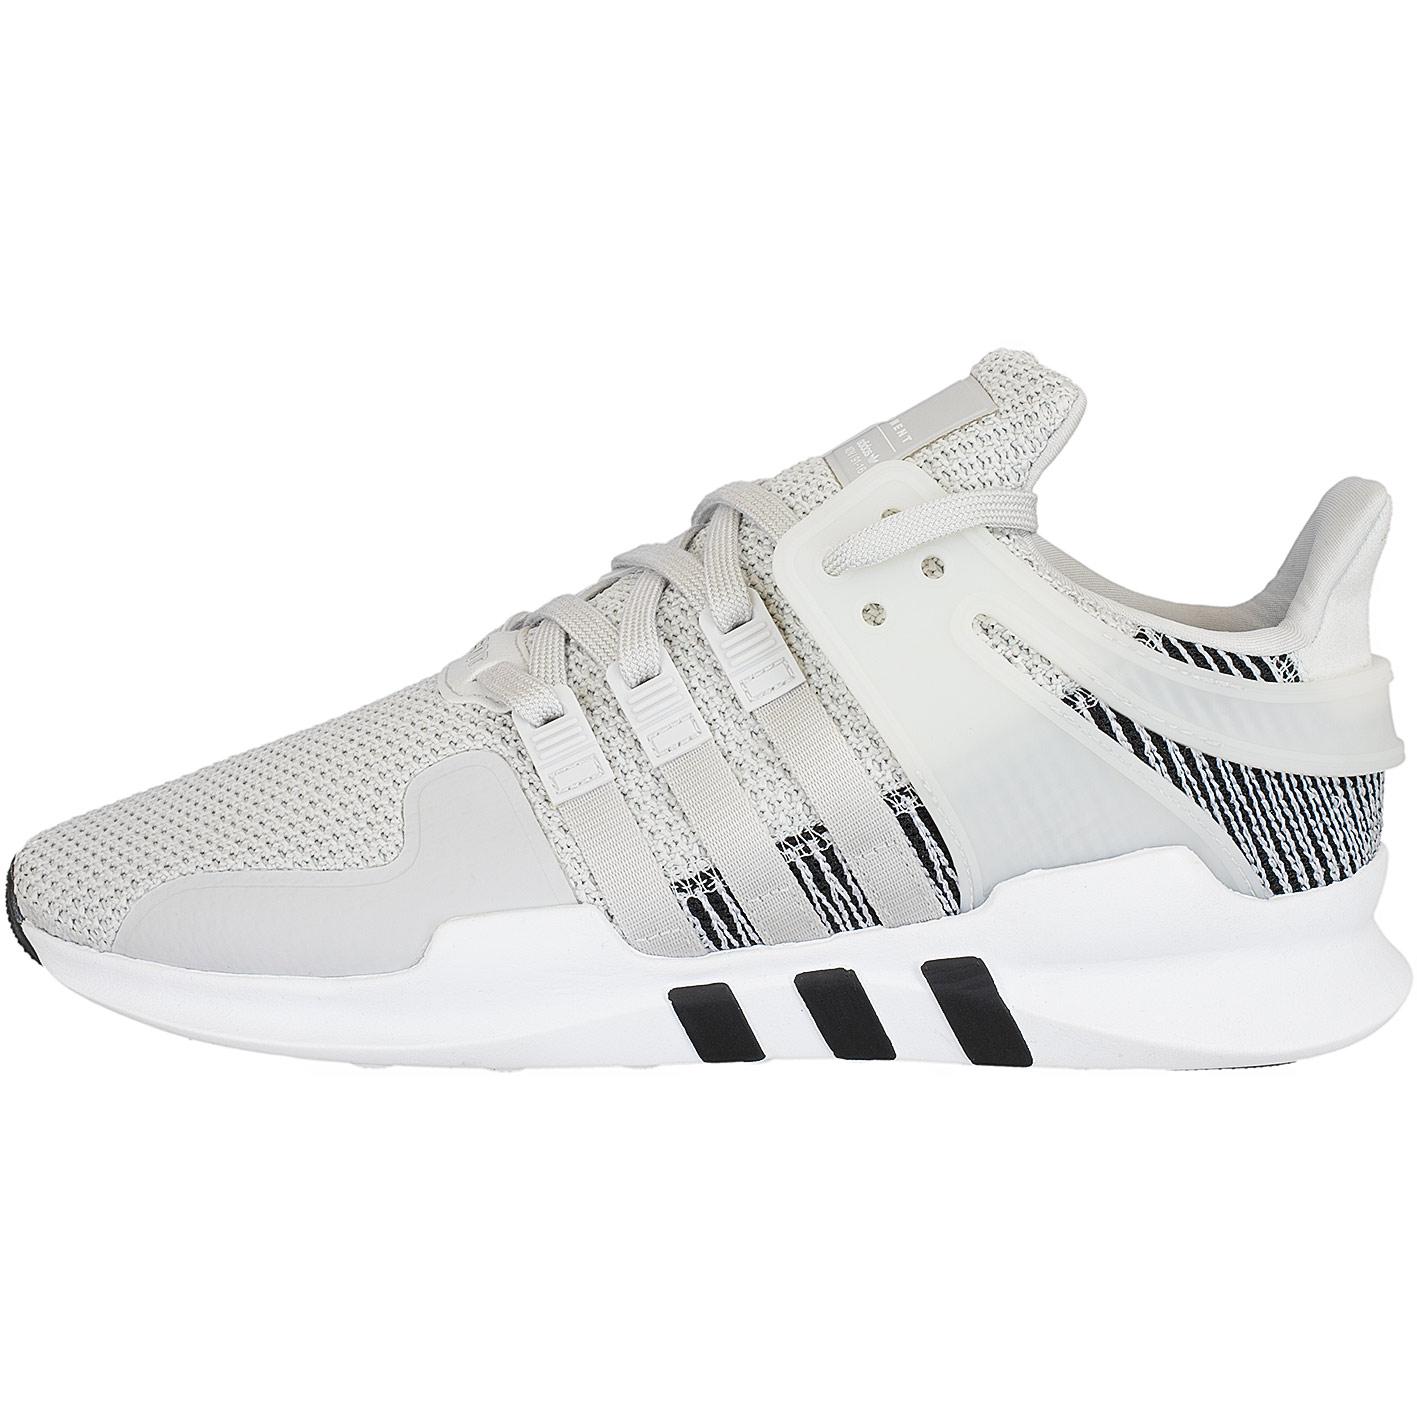 new style d796c c64da Adidas Originals Sneaker Equipment Support ADV weißgrau